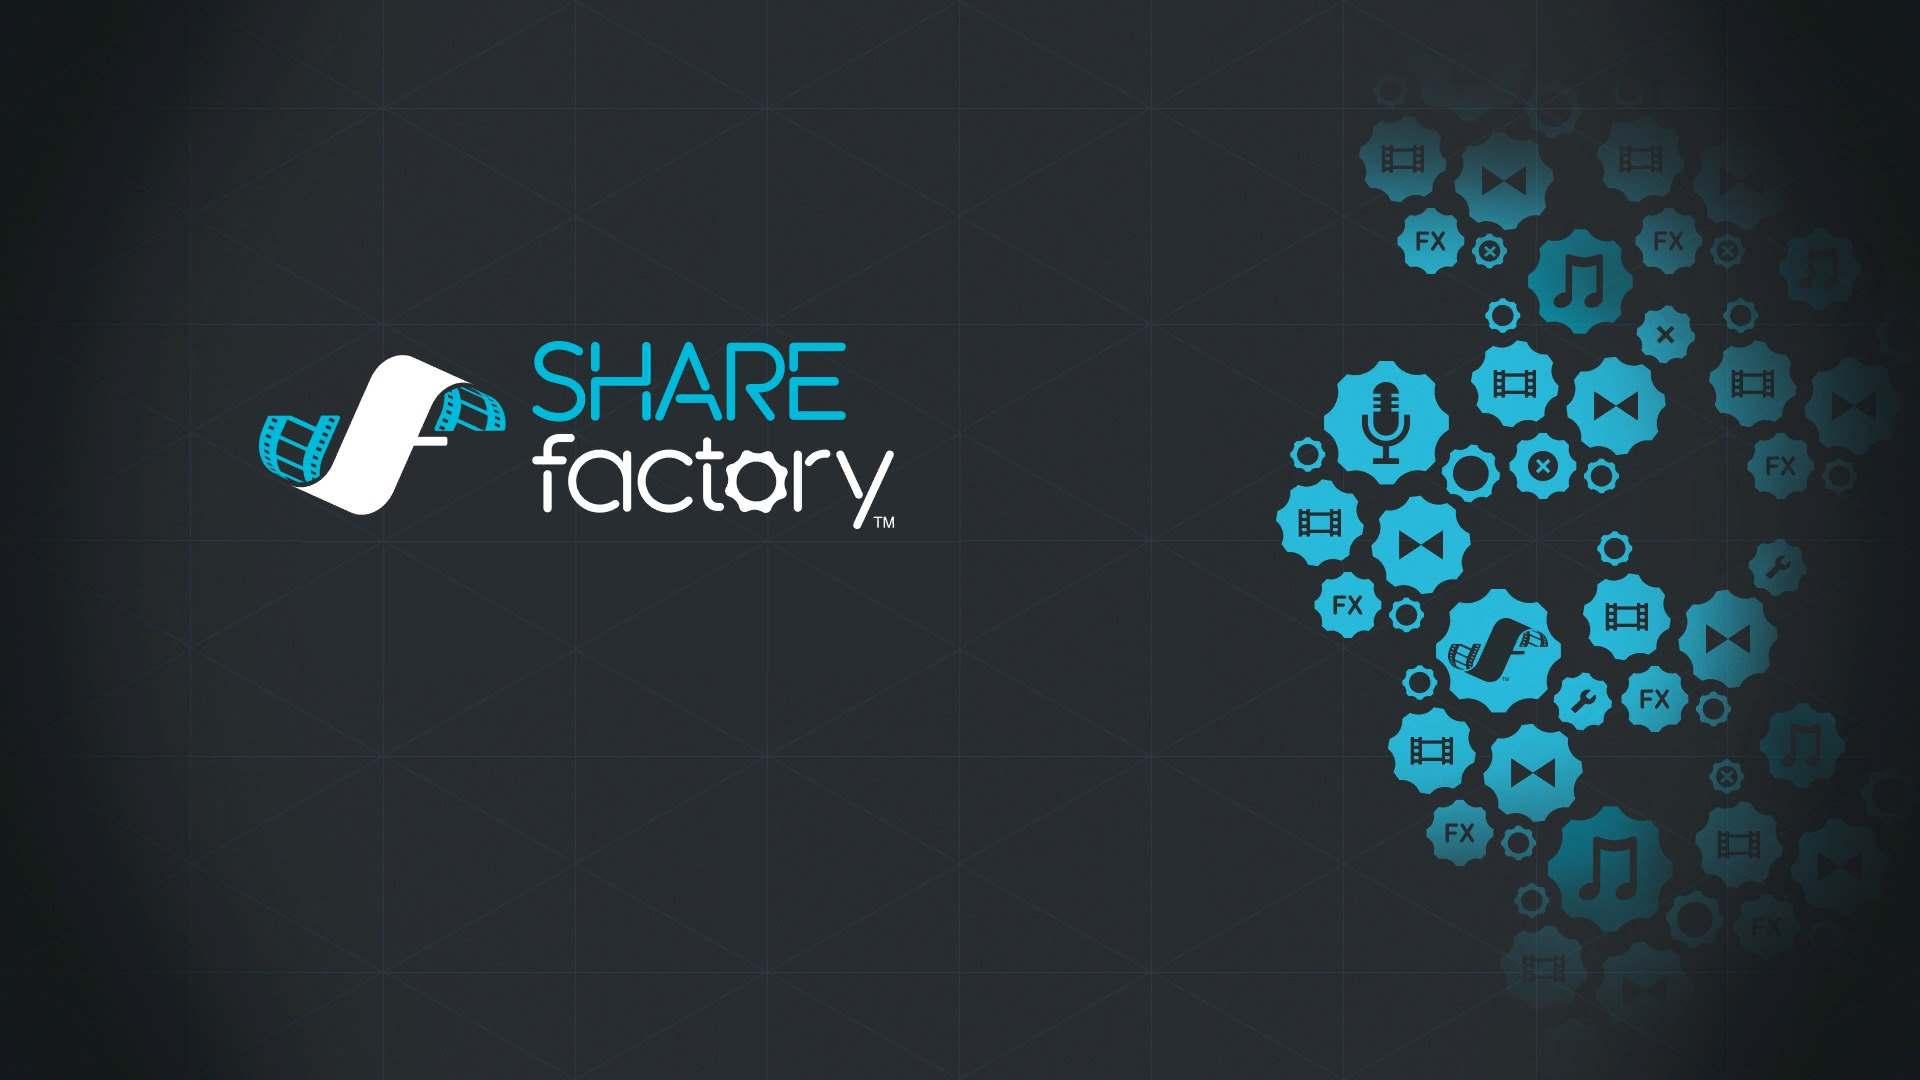 www.culturageek.com.ar ShareFactory Actualización Playstation Gifs 1